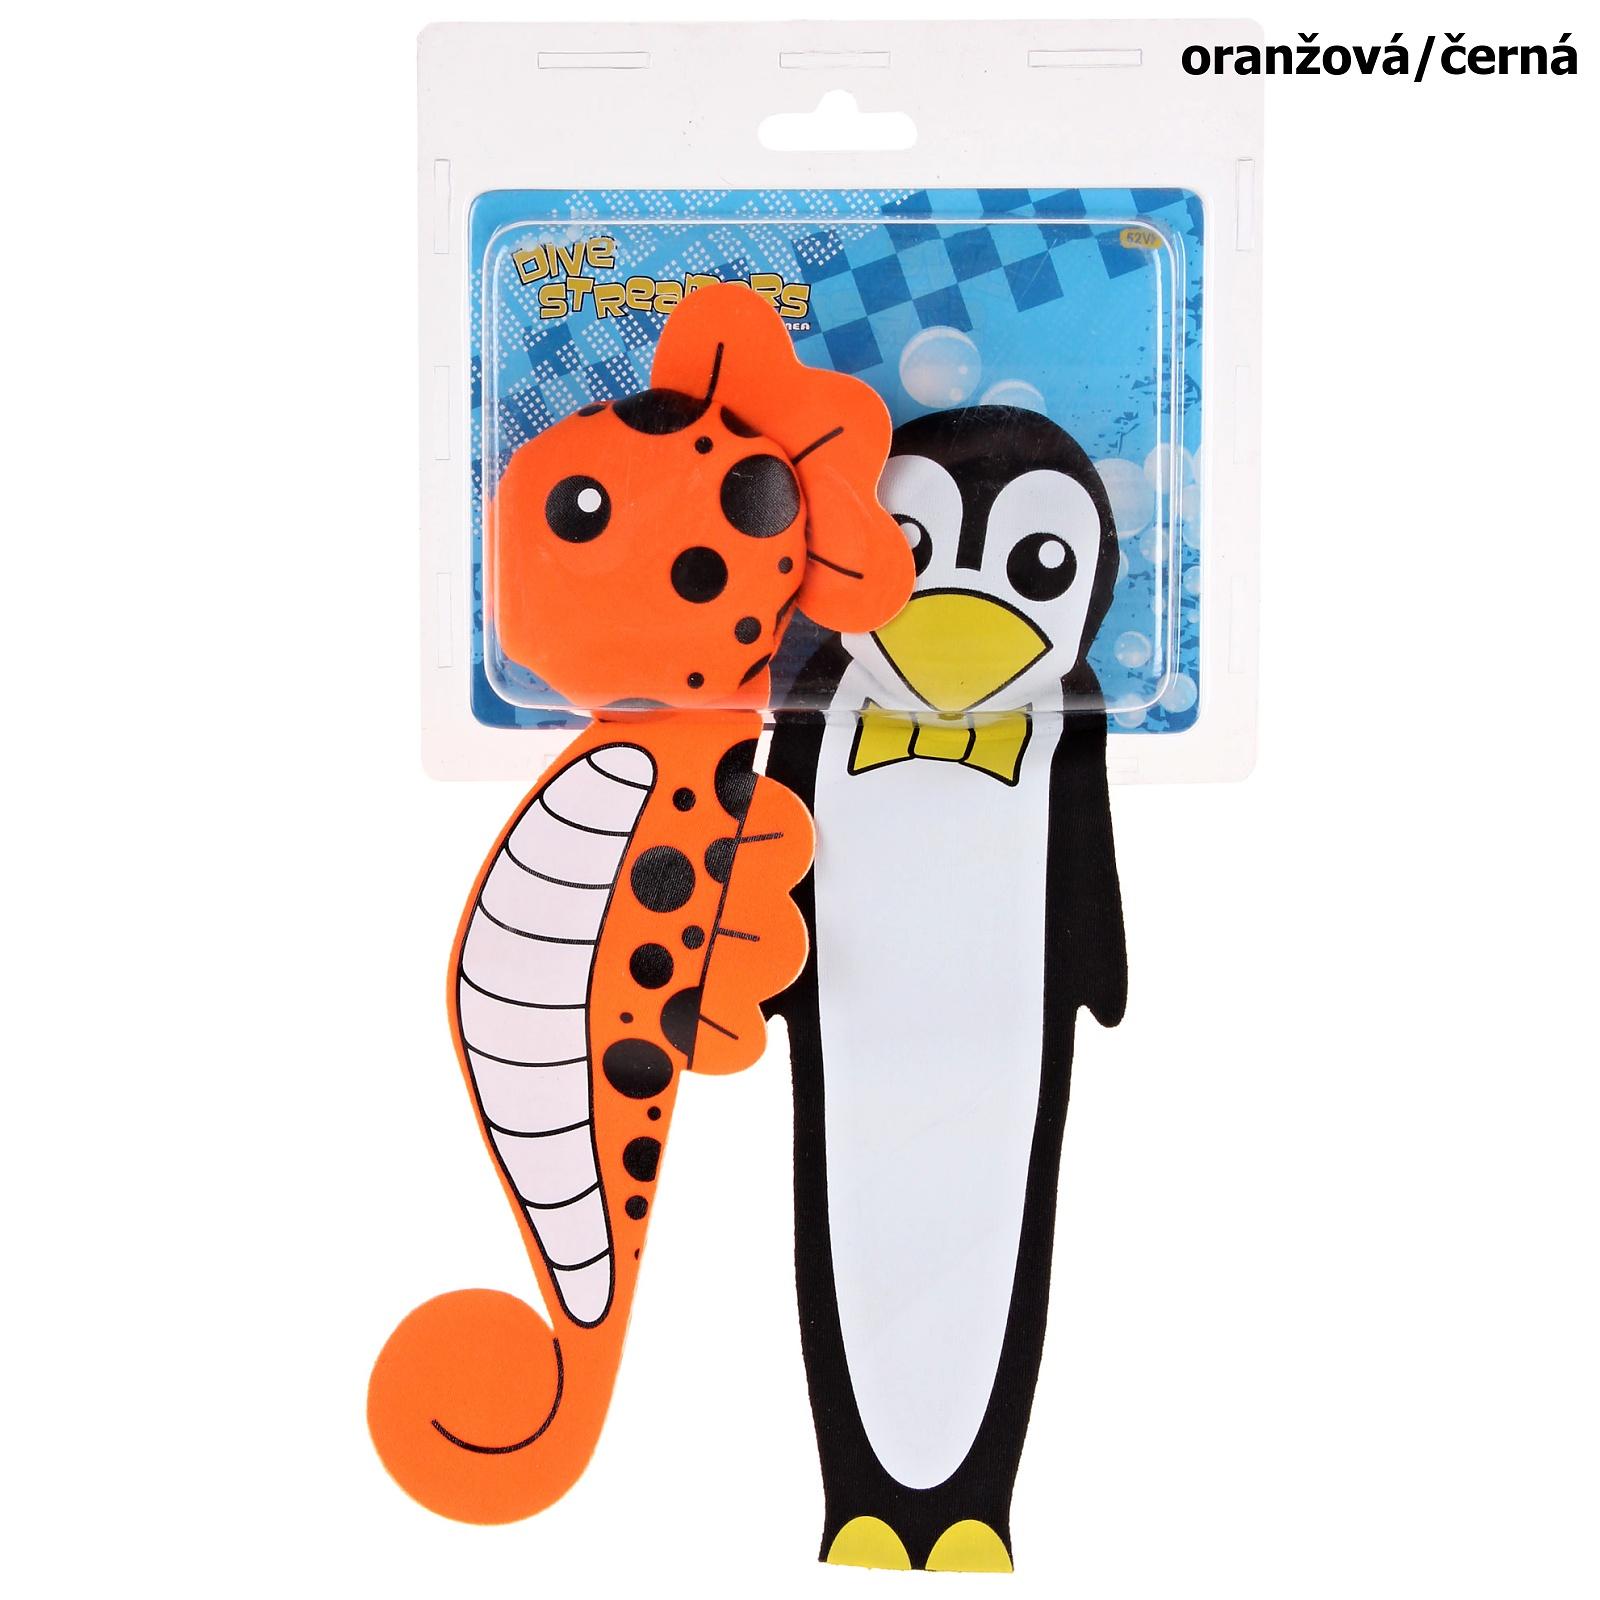 Potápěcí bomby WAIMEA Animal oranžová/černá, sada 2ks